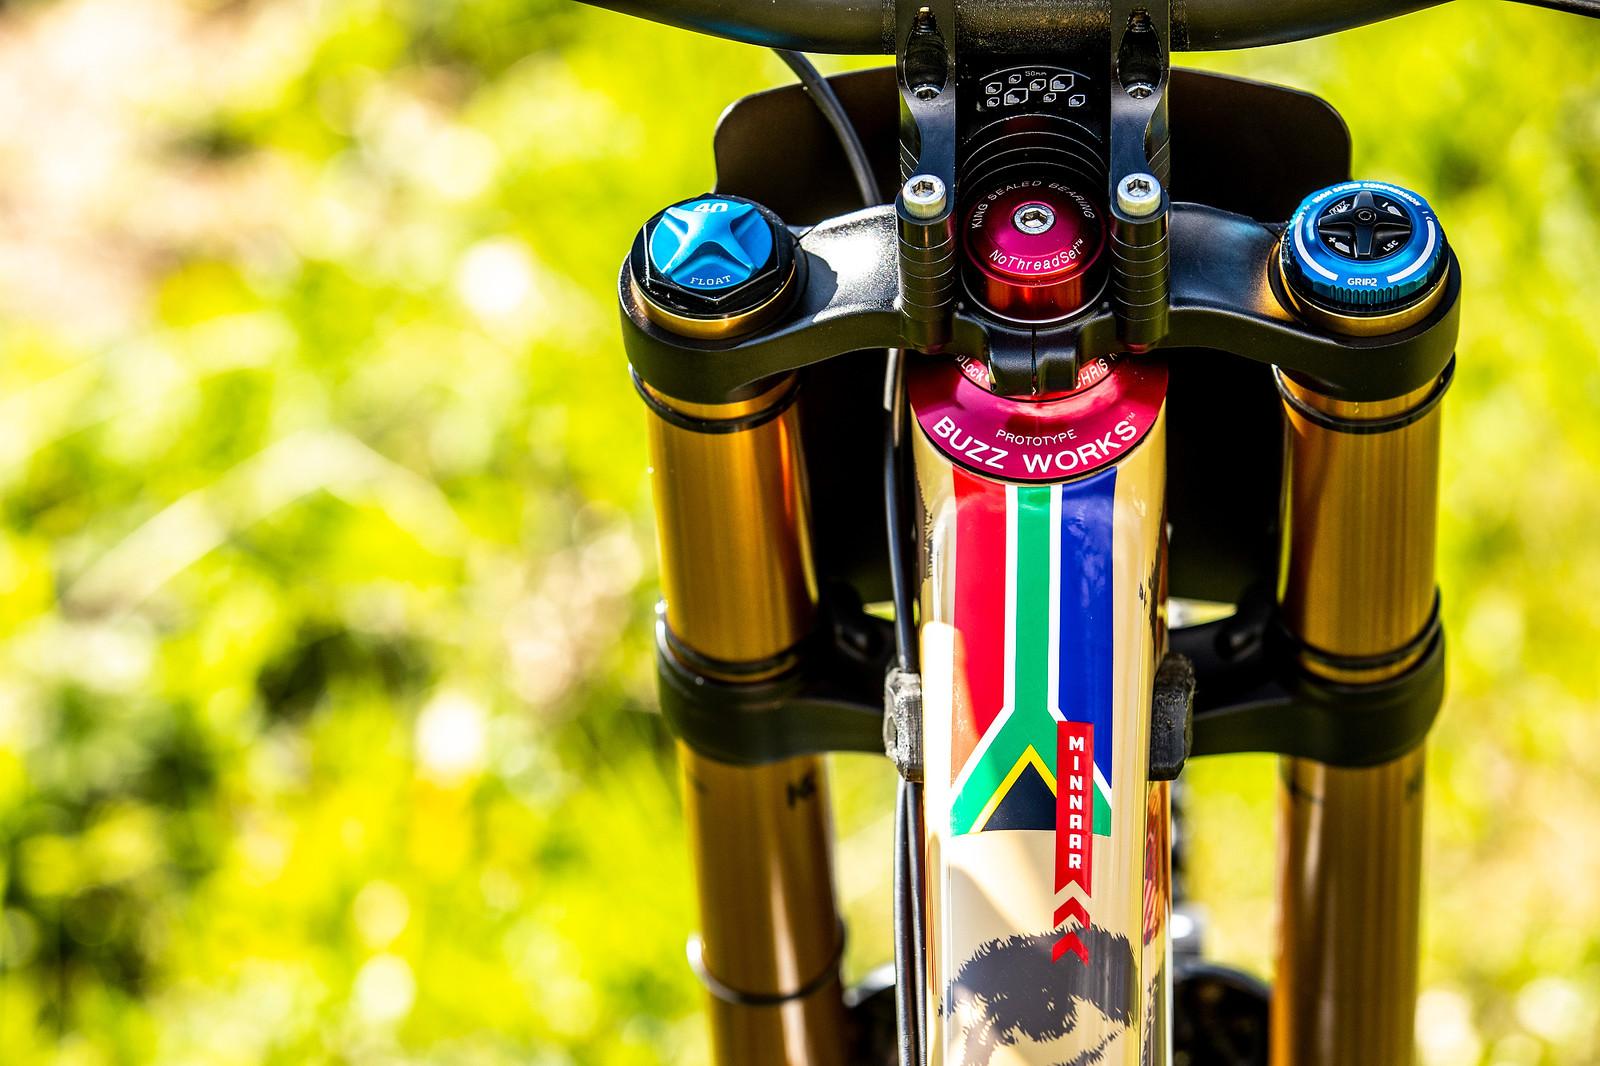 Saffa Sender - WORLD CHAMPS BIKE - Greg Minnaar's Santa Cruz V10 - Mountain Biking Pictures - Vital MTB